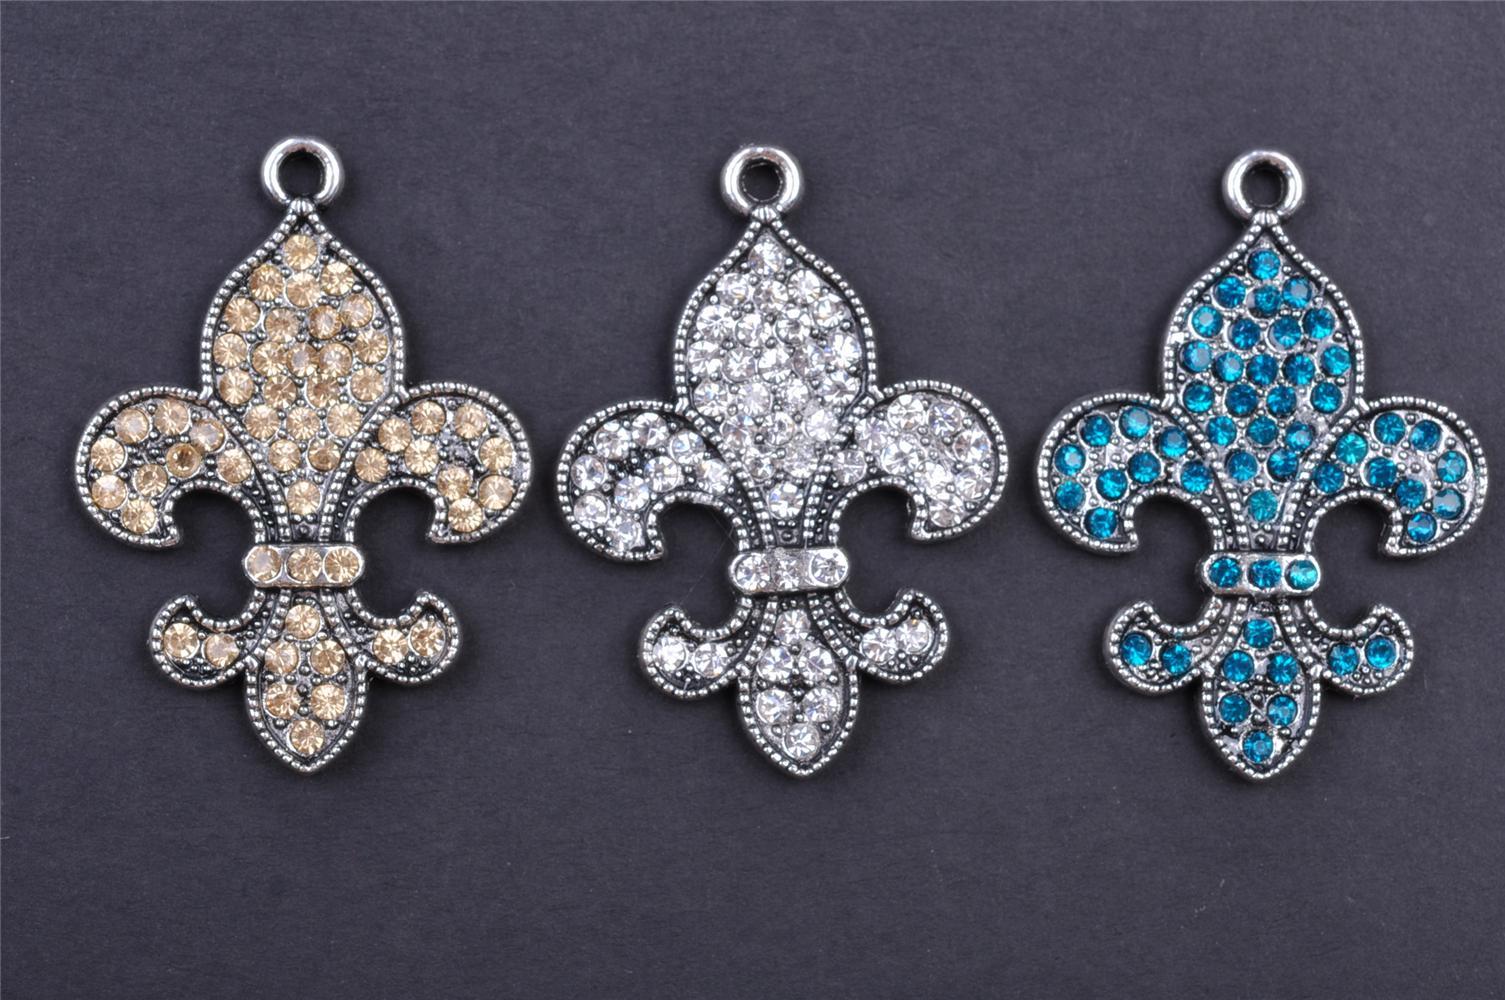 2018 42mm Iris Flower De Luce Pendant Beads Crystal Charms 7106